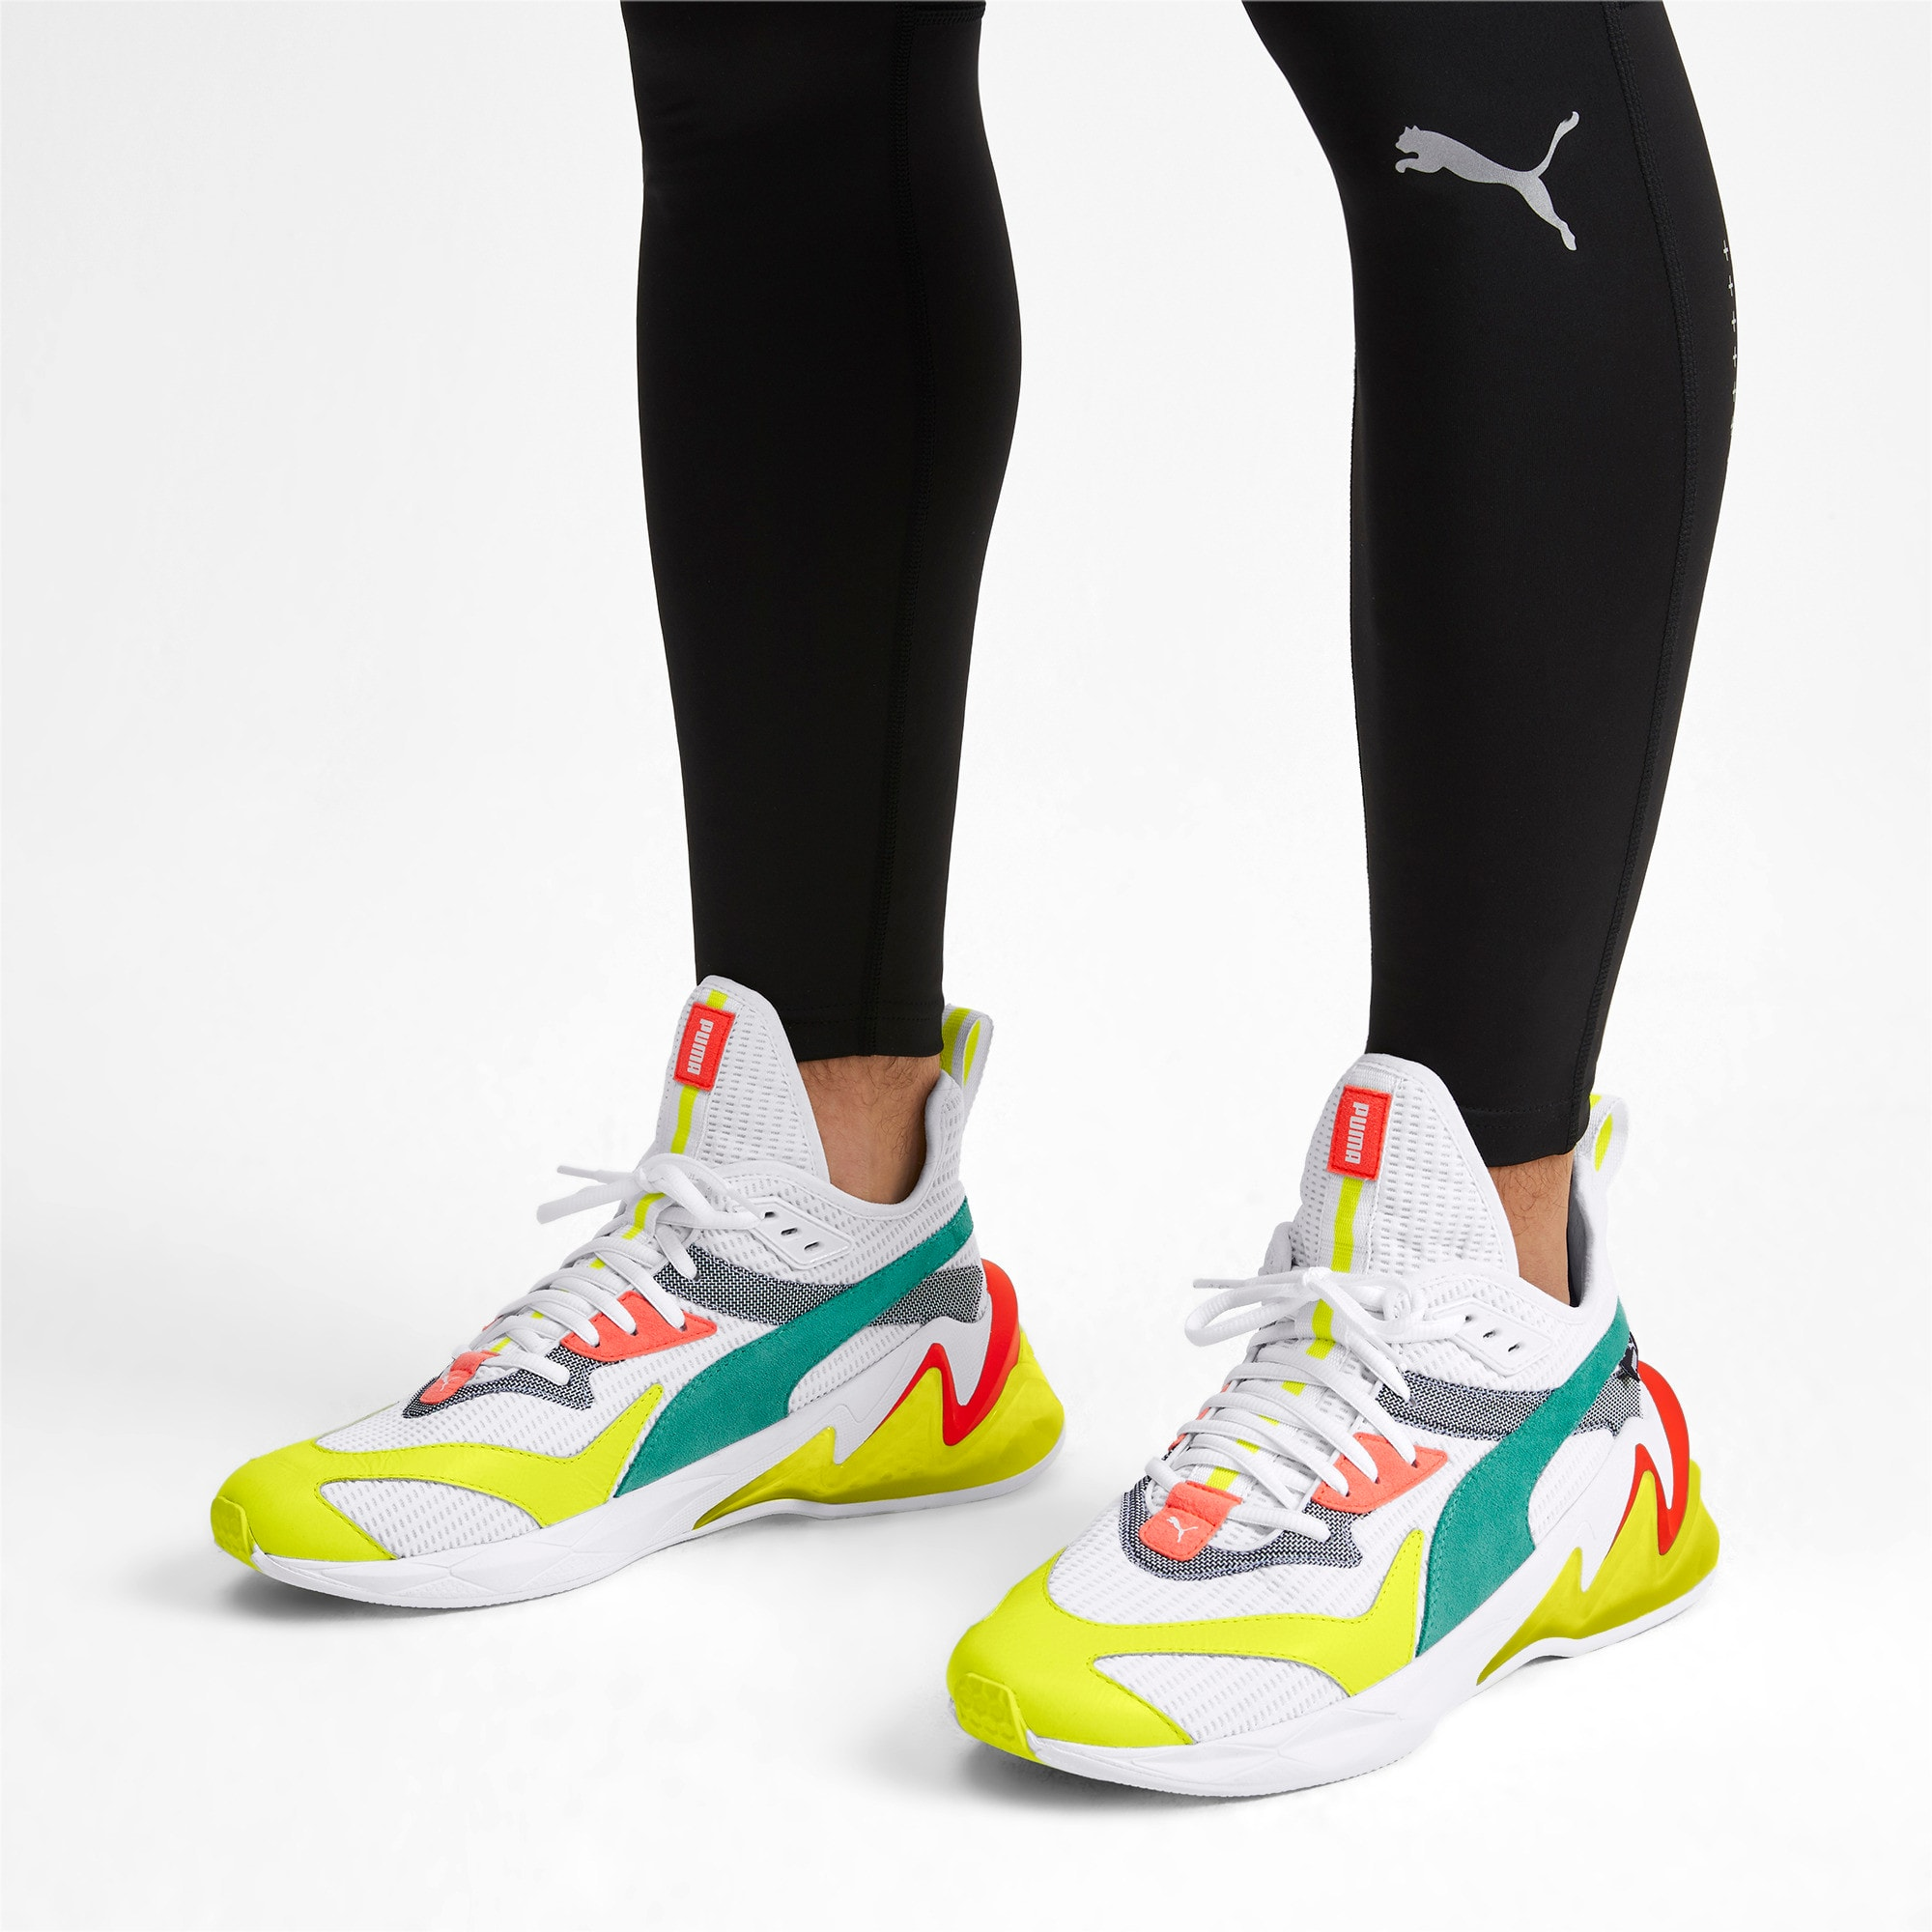 Thumbnail 2 of LQDCELL Origin Men's Training Shoes, Puma White-Yellow Alert, medium